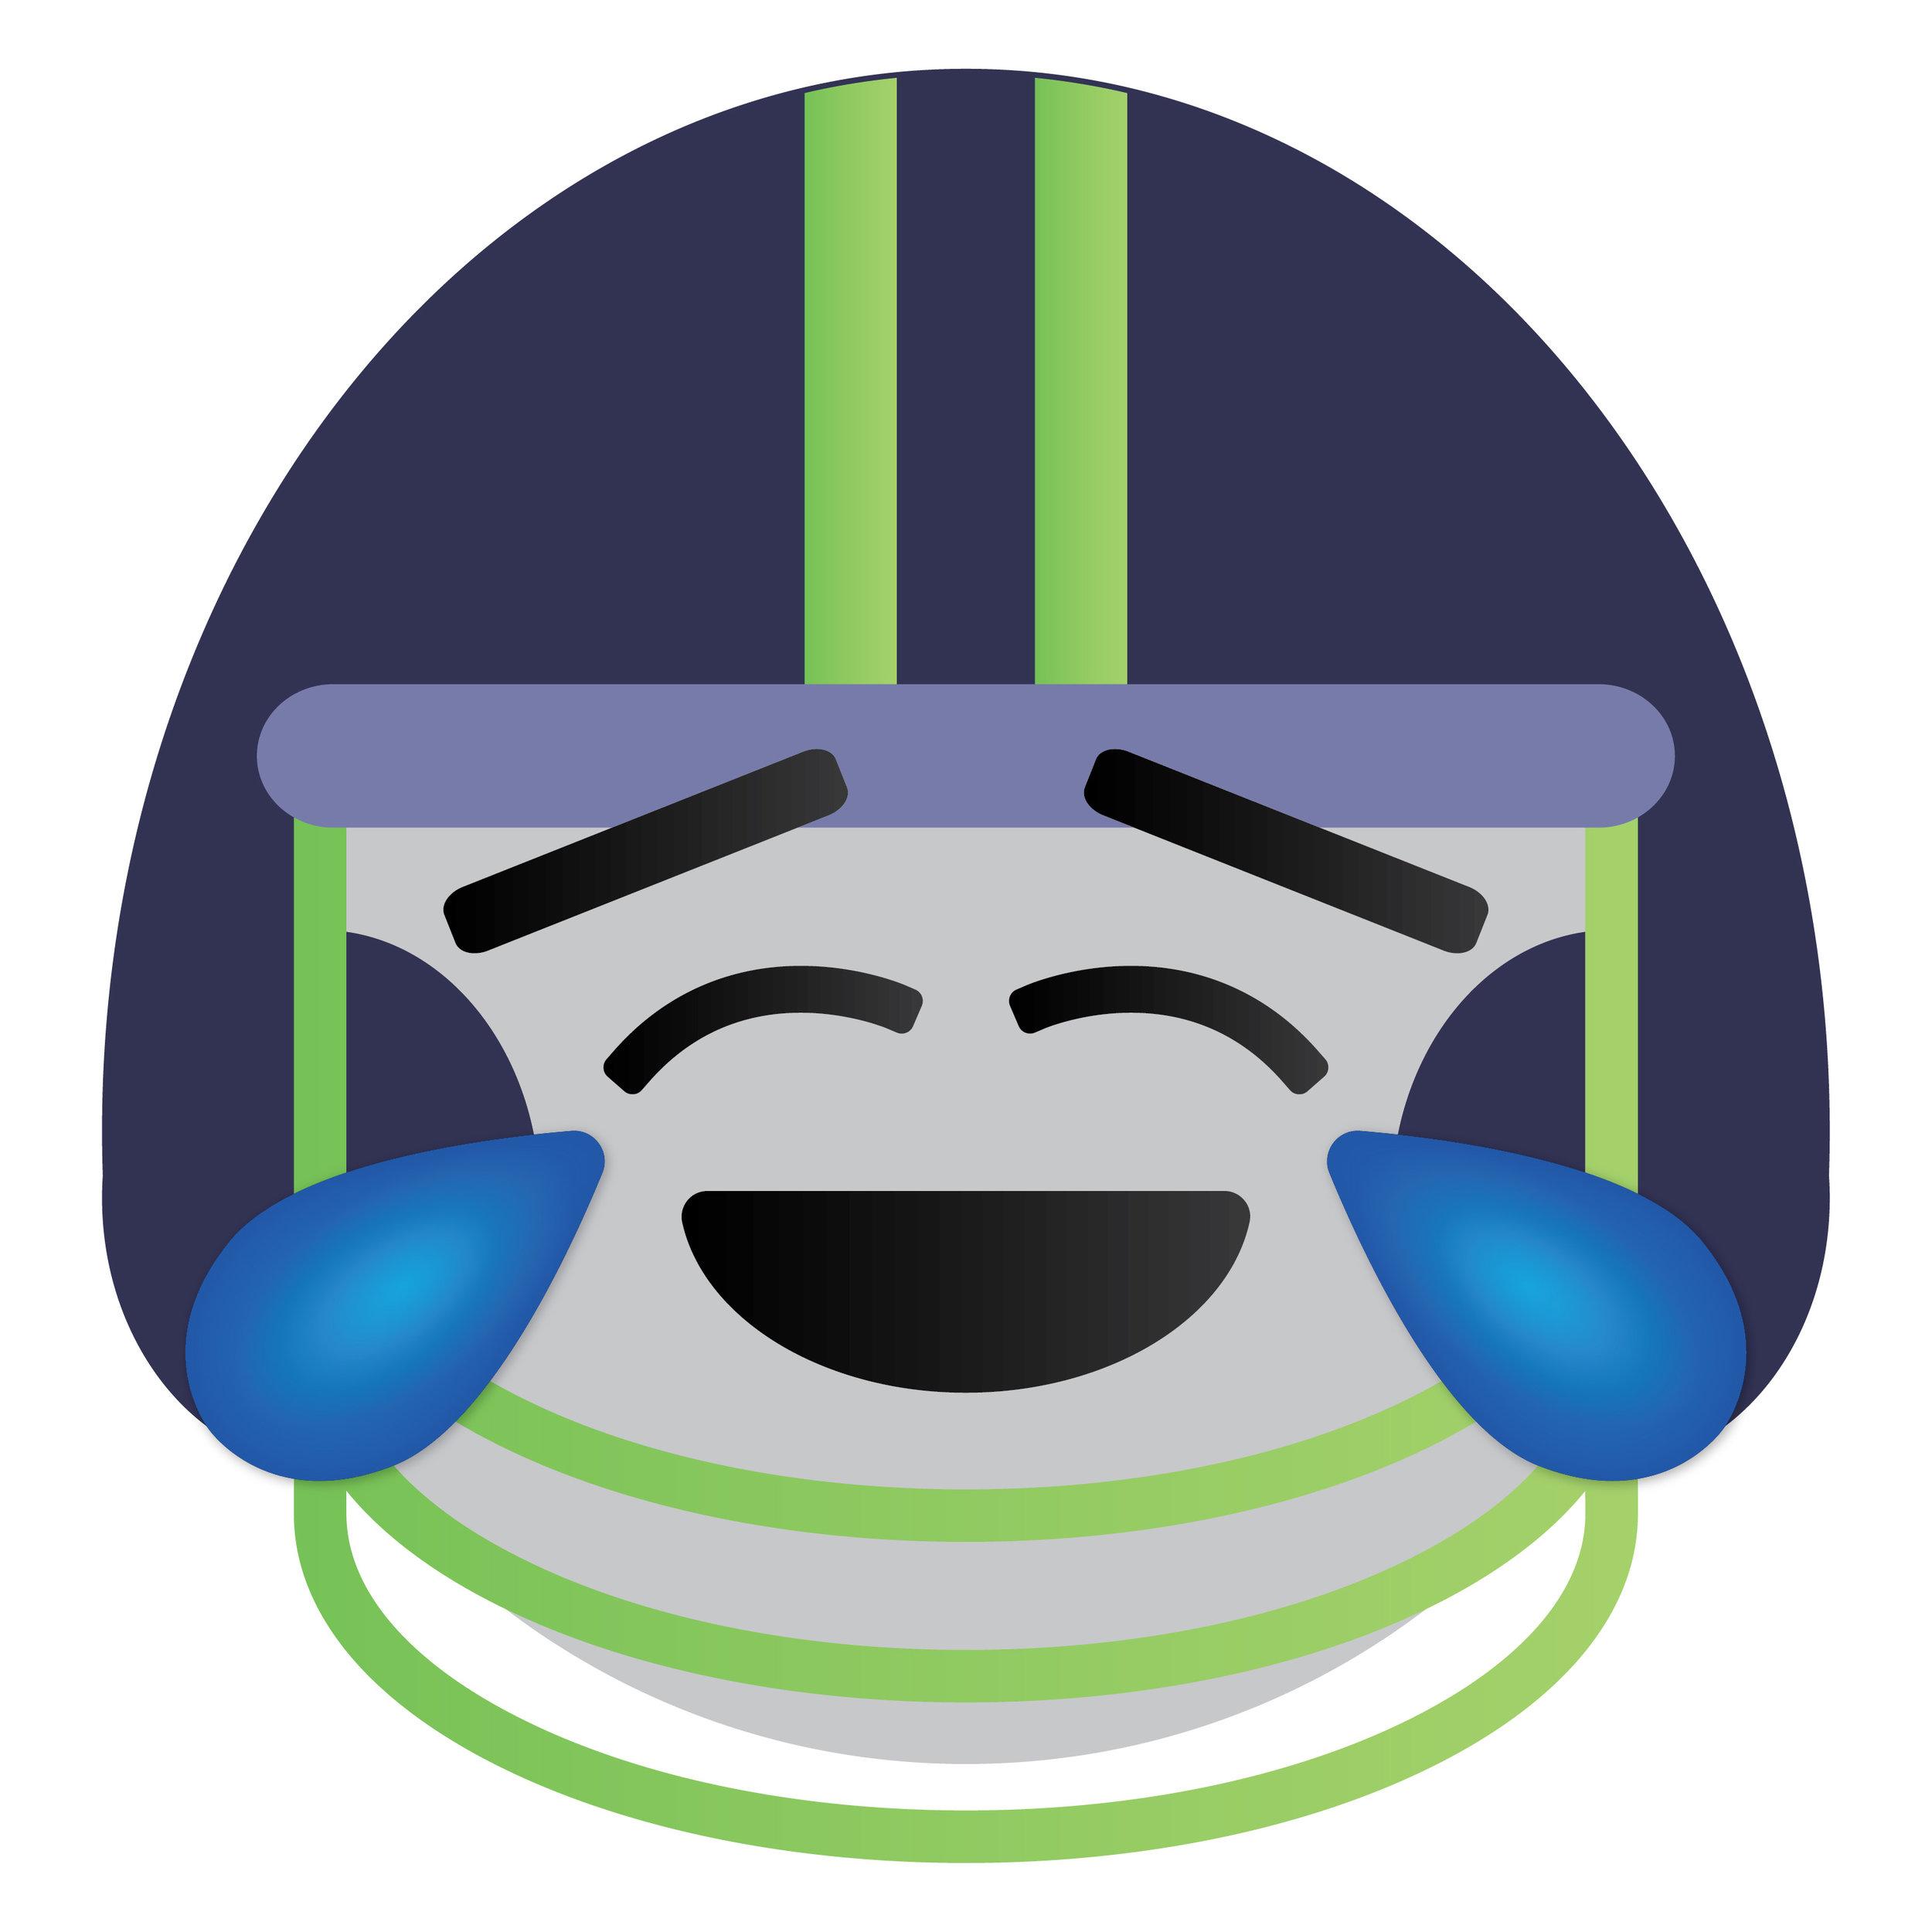 Emojis_Fall2018 [Recovered]_DM_Emoji_5.jpg